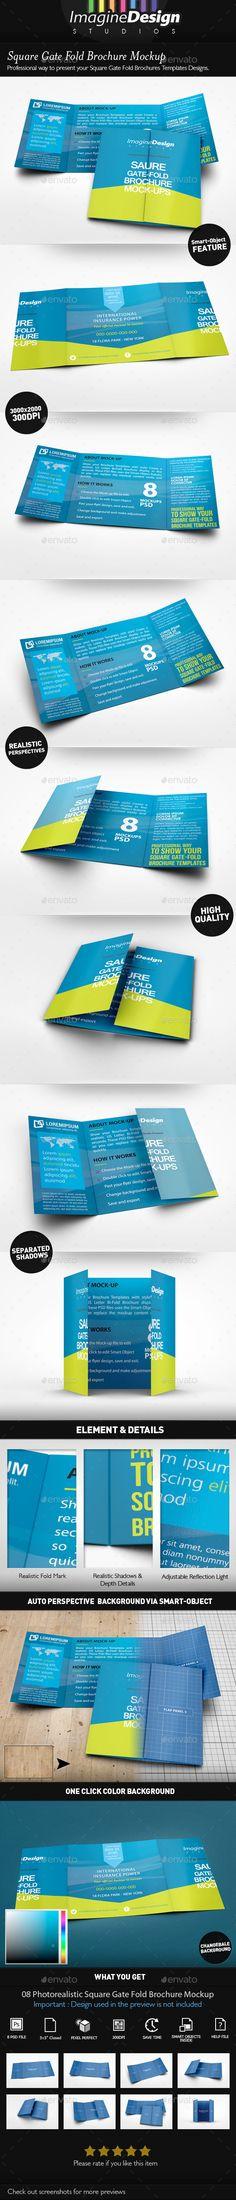 Infographic resume - Agata Rocka, Rocka Design LLC communicate - gate fold brochure mockup